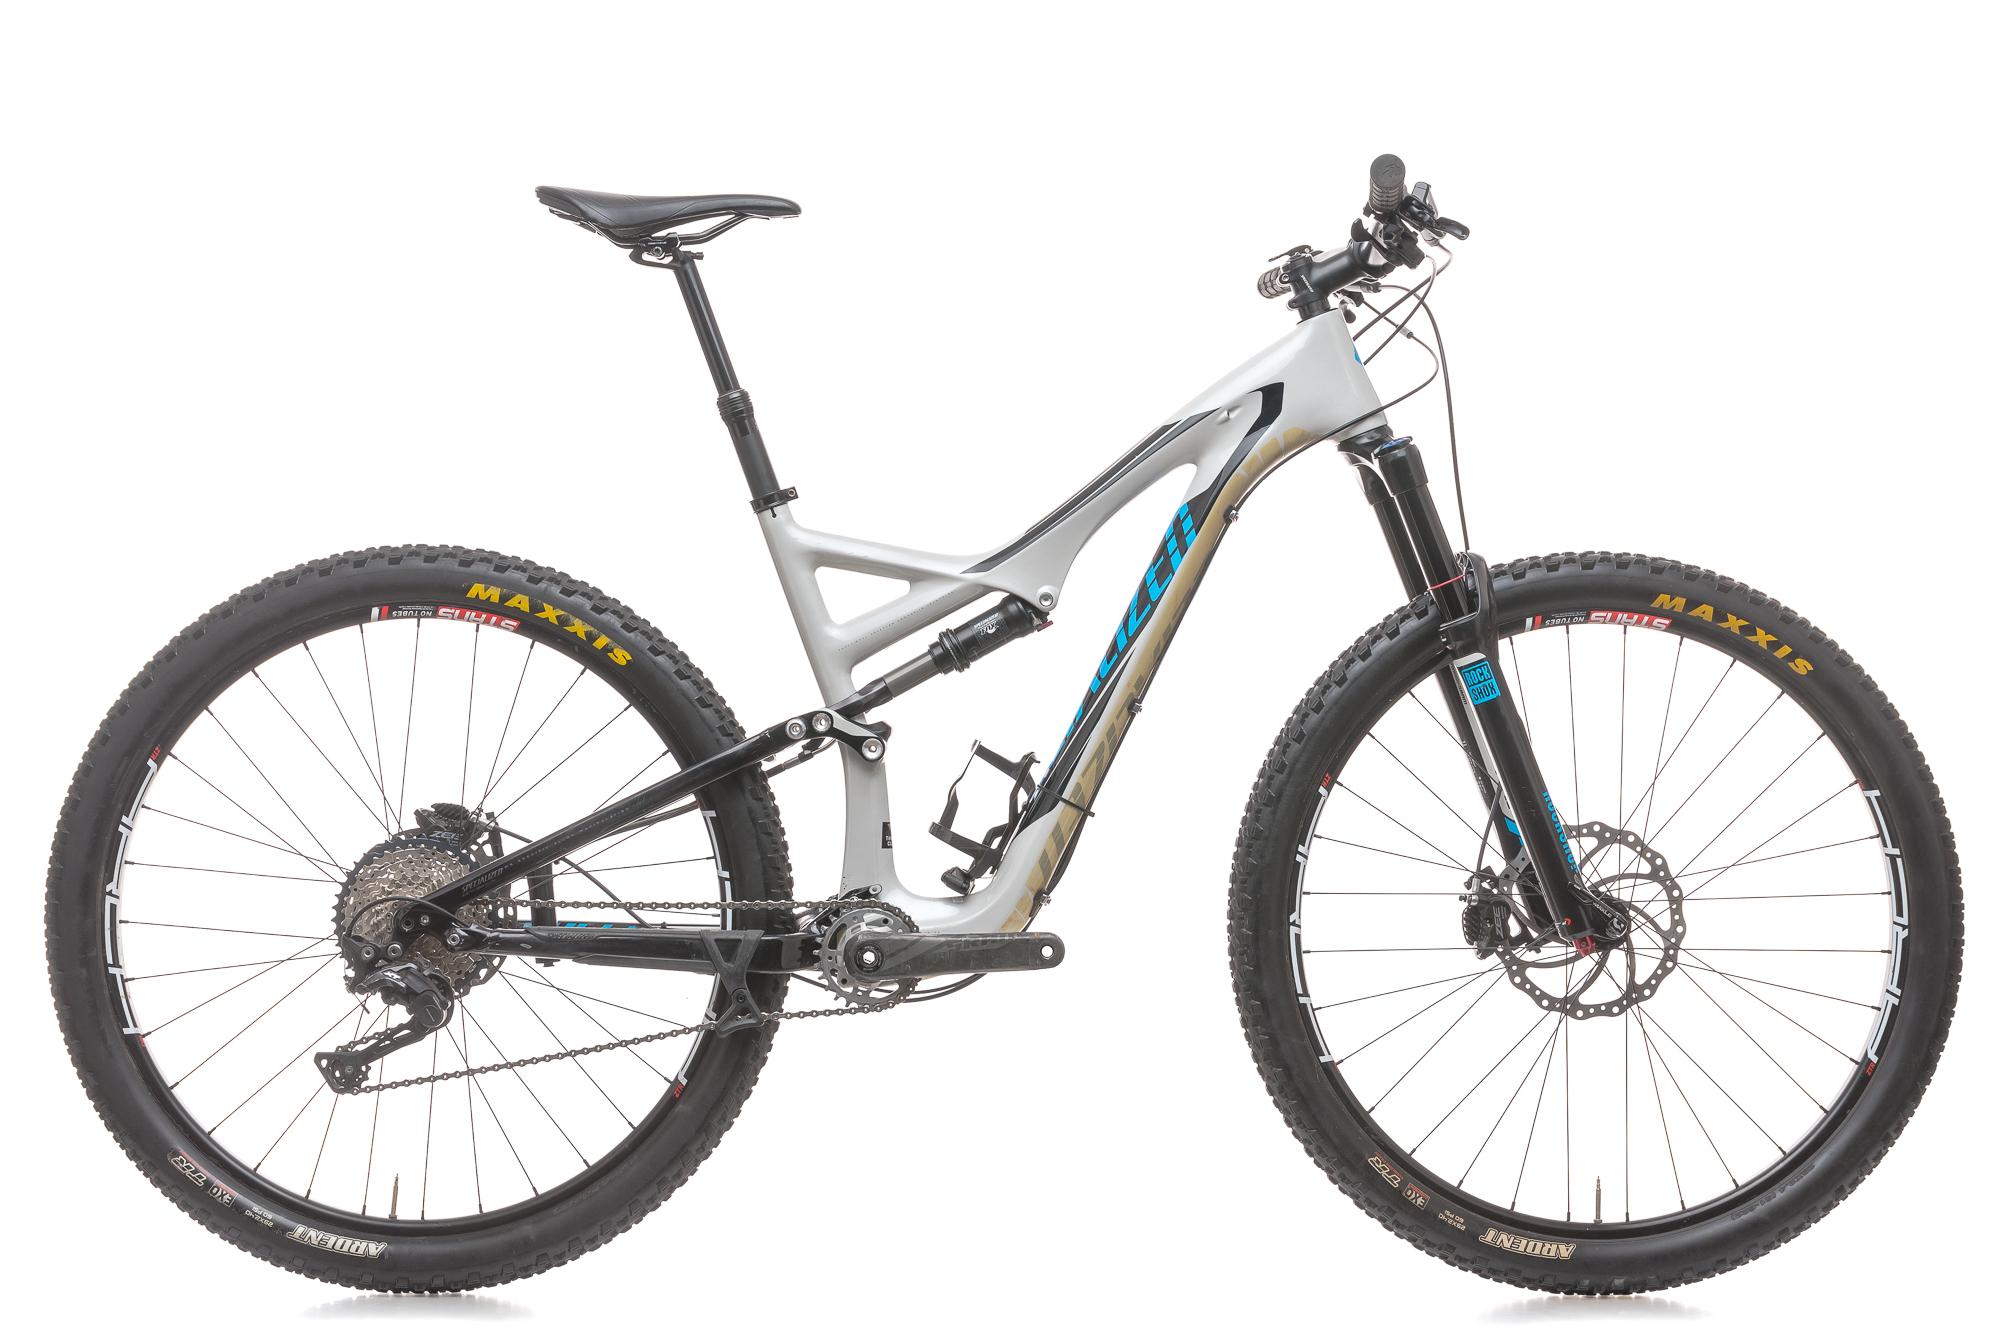 6365c40edc3 2015 Specialized Stumpjumper FSR Expert Carbon 29 Mountain Bike Large  Shimano